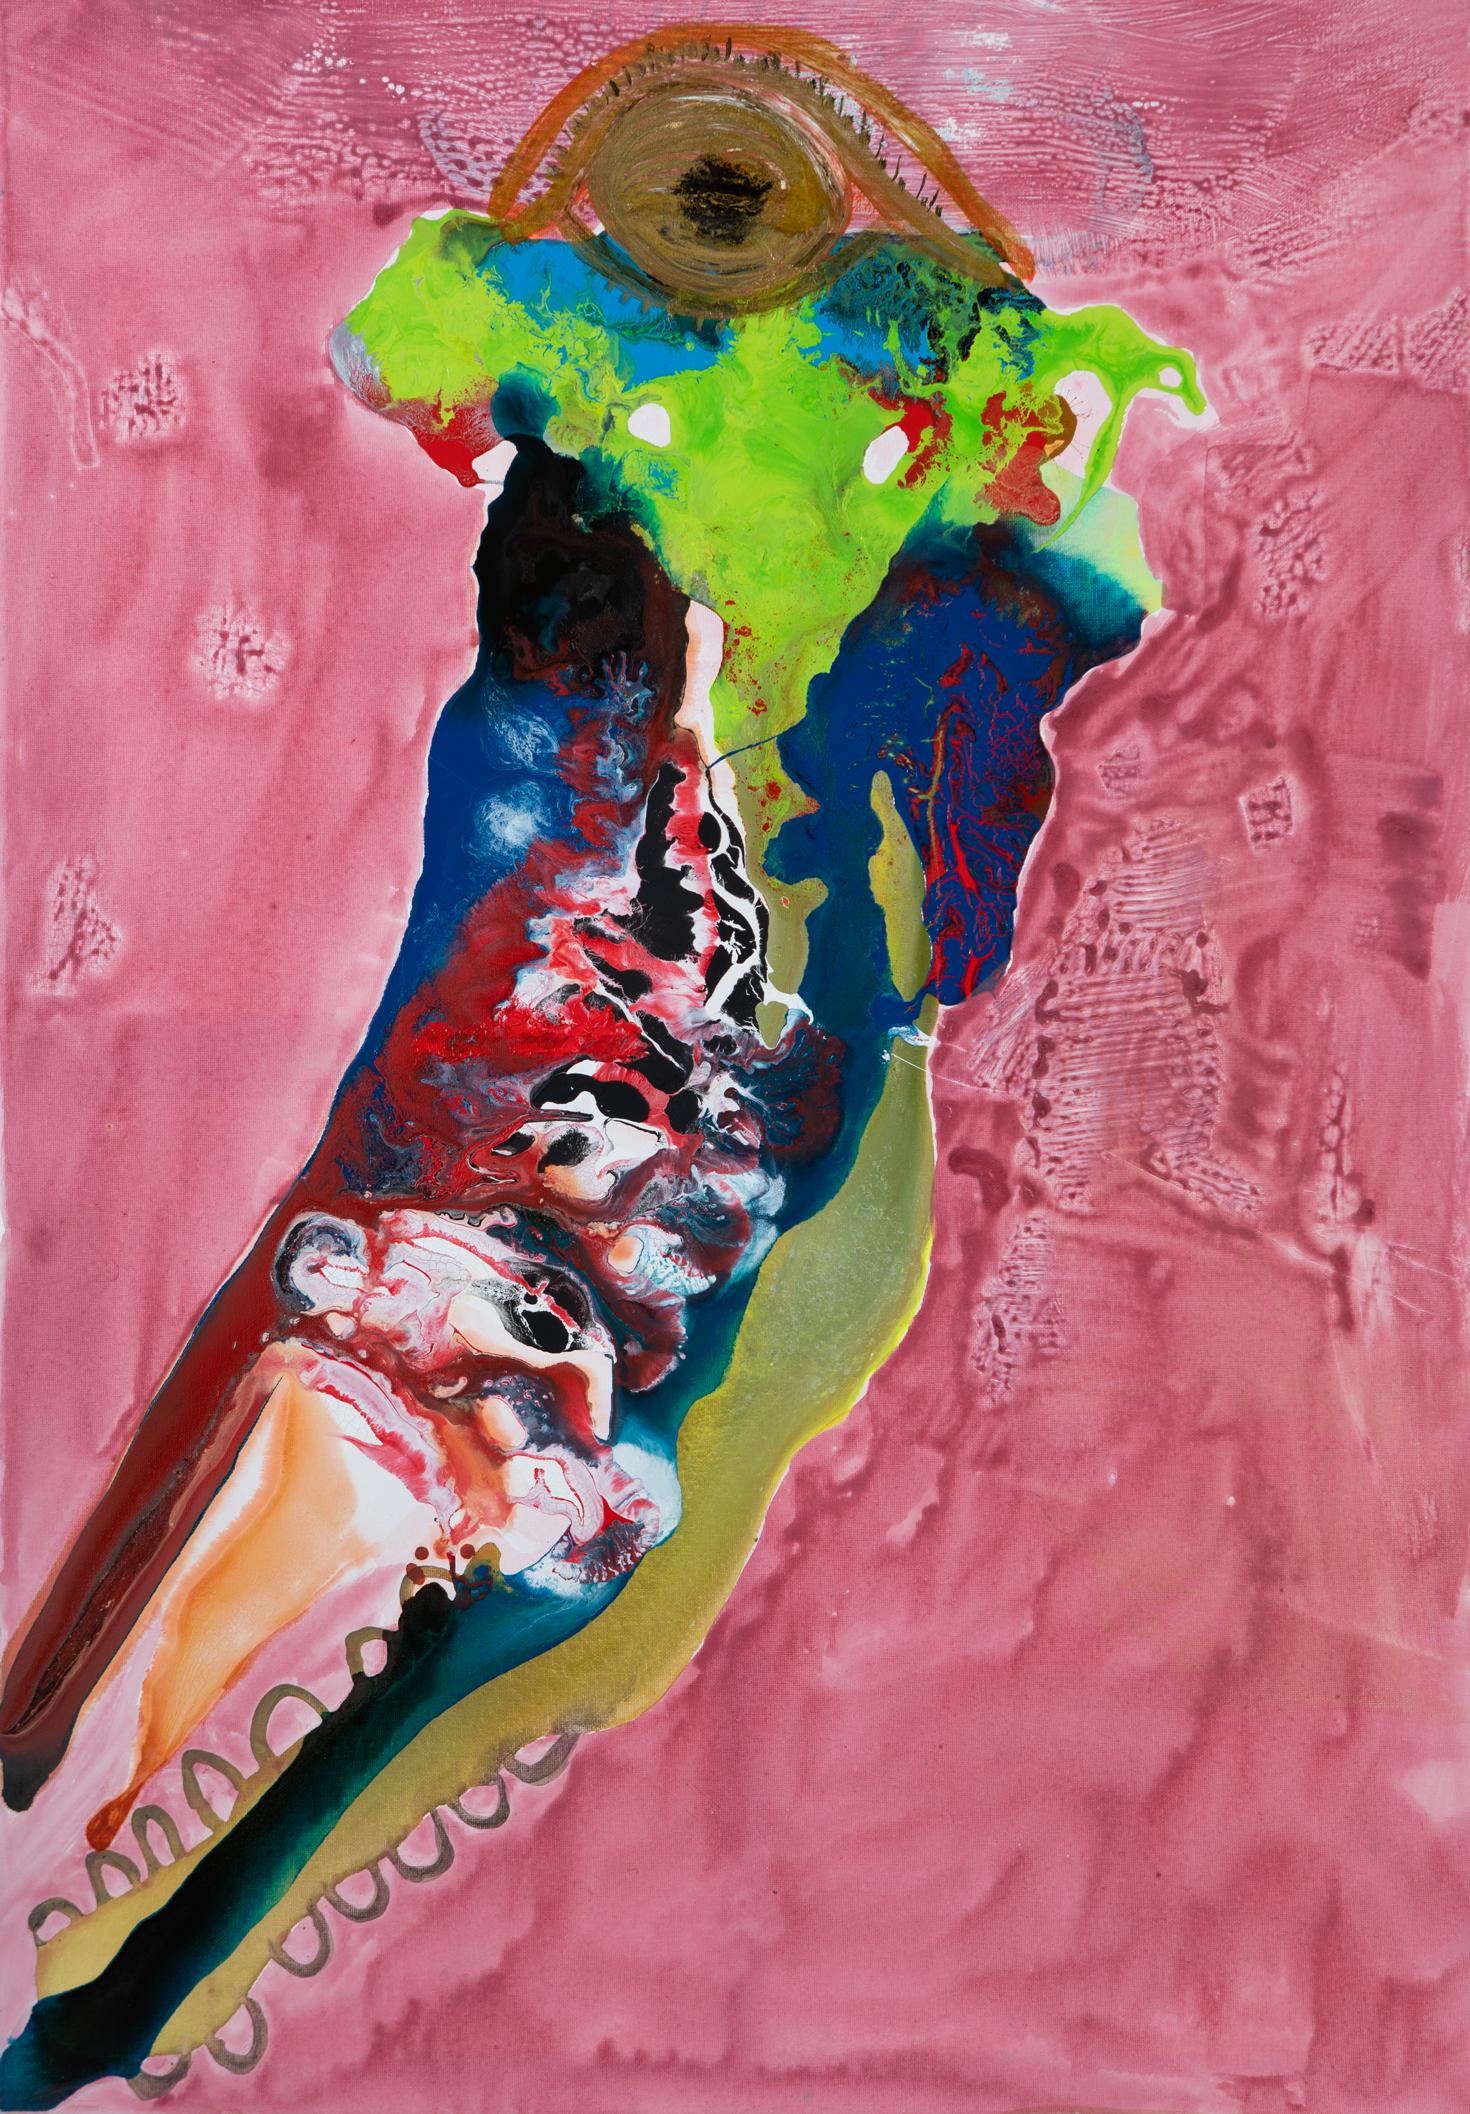 Vergangenheit - 2017Acryl auf Leinwand701 x 100 cm